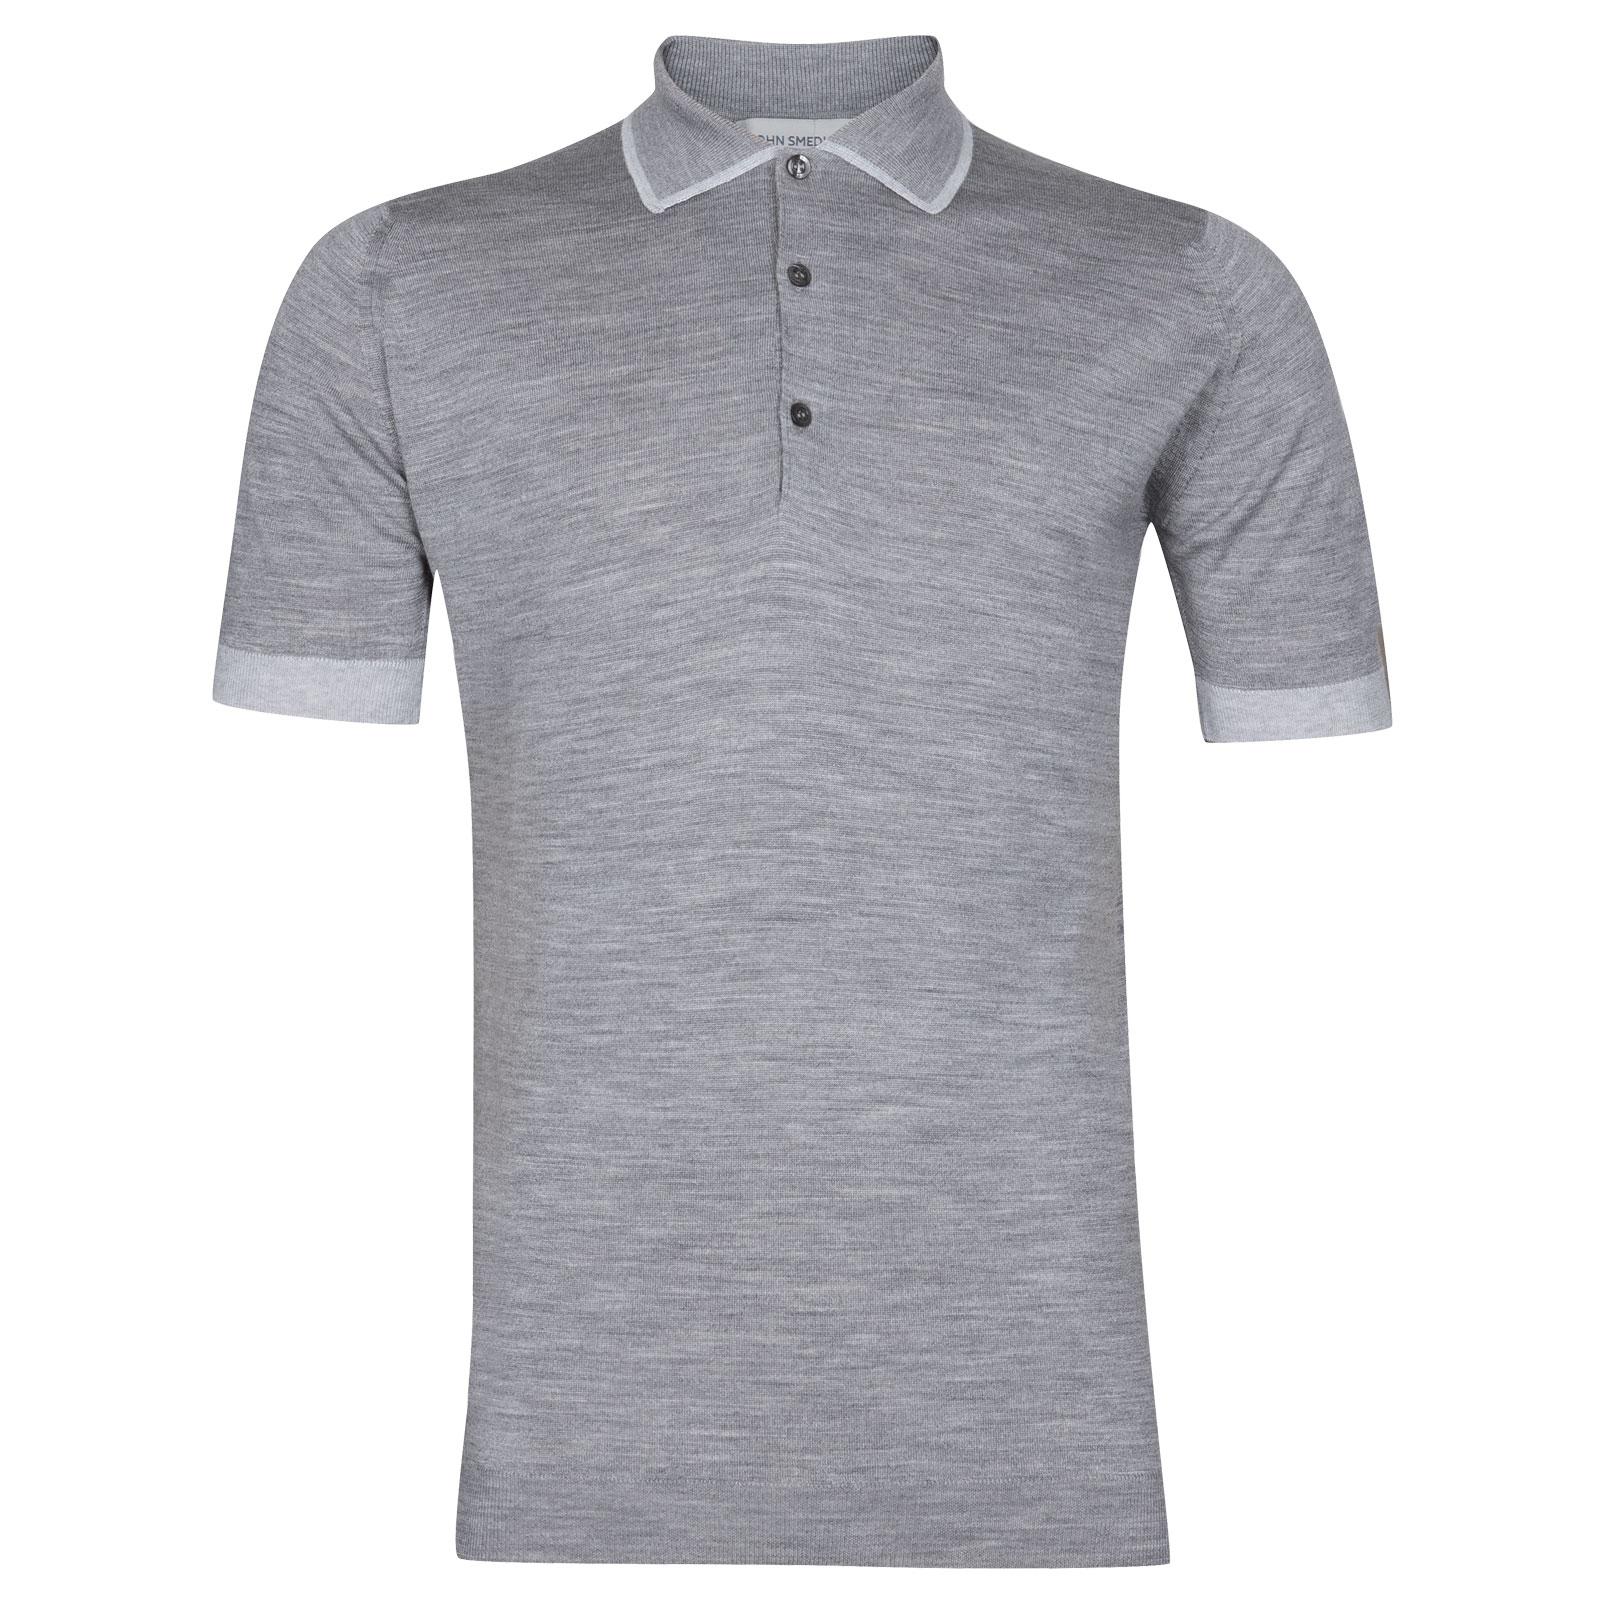 John Smedley Nailsea Extra Fine Merino Shirt in Silver-L